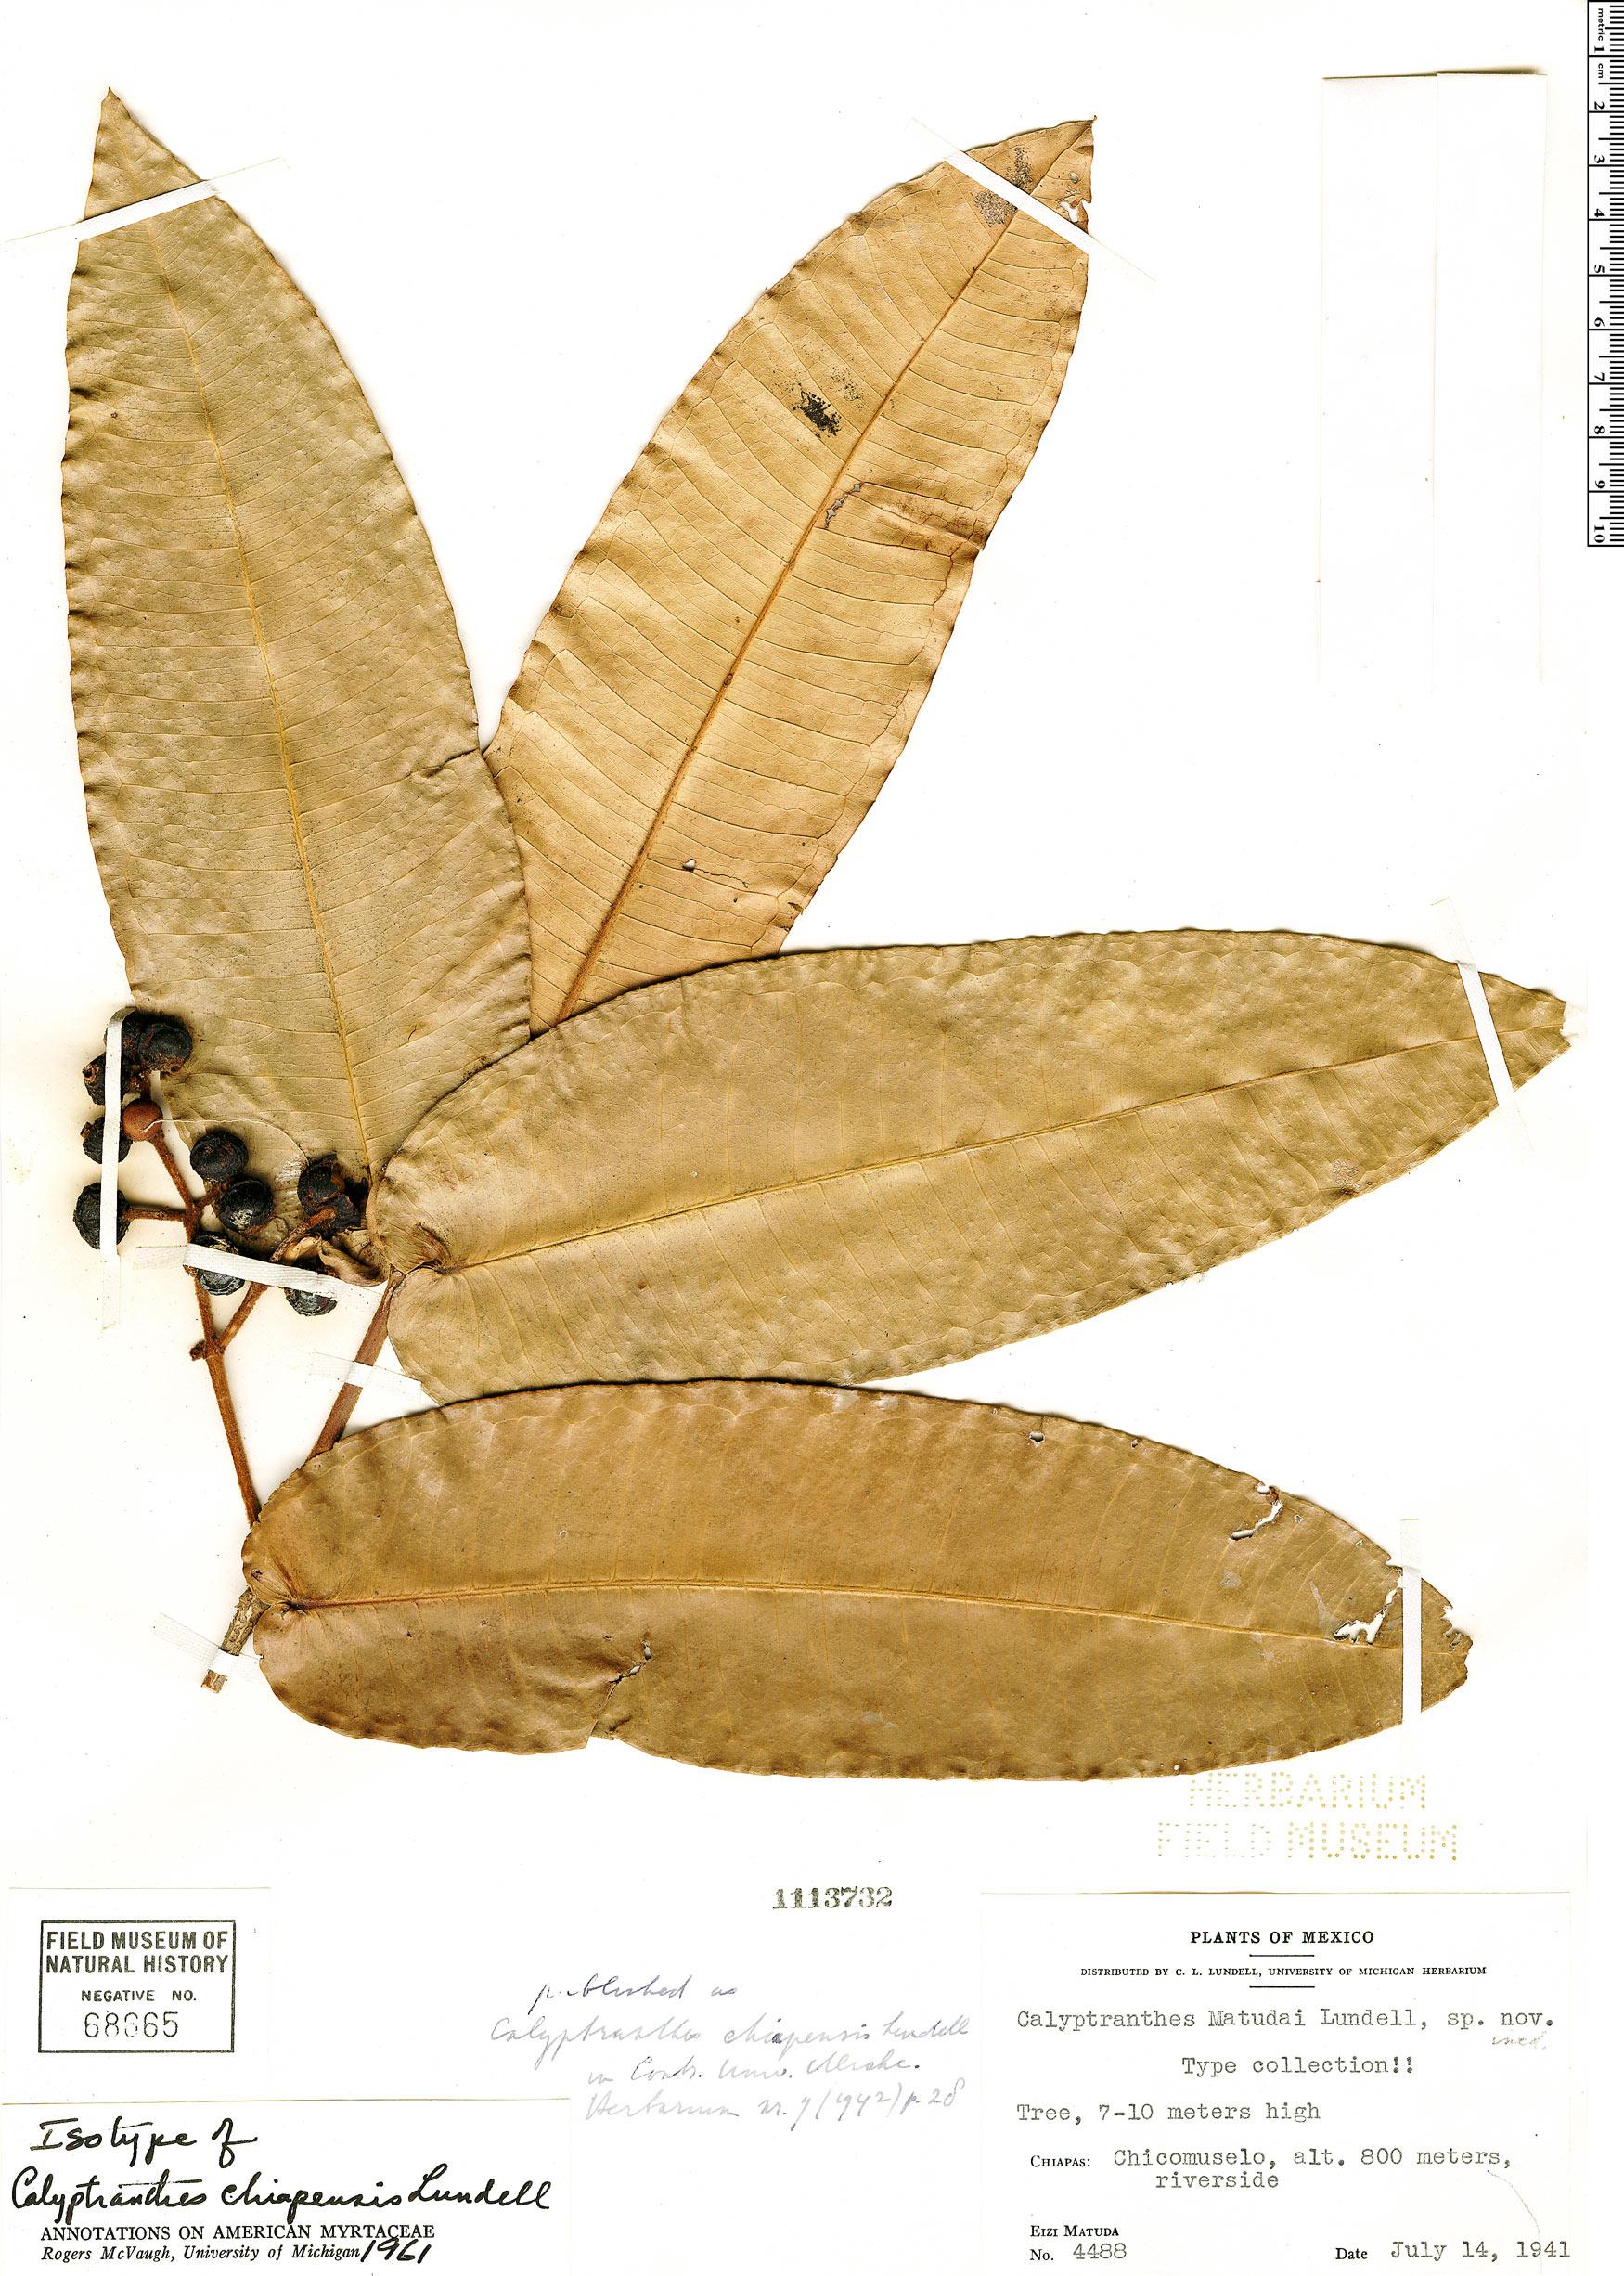 Specimen: Calyptranthes chiapensis